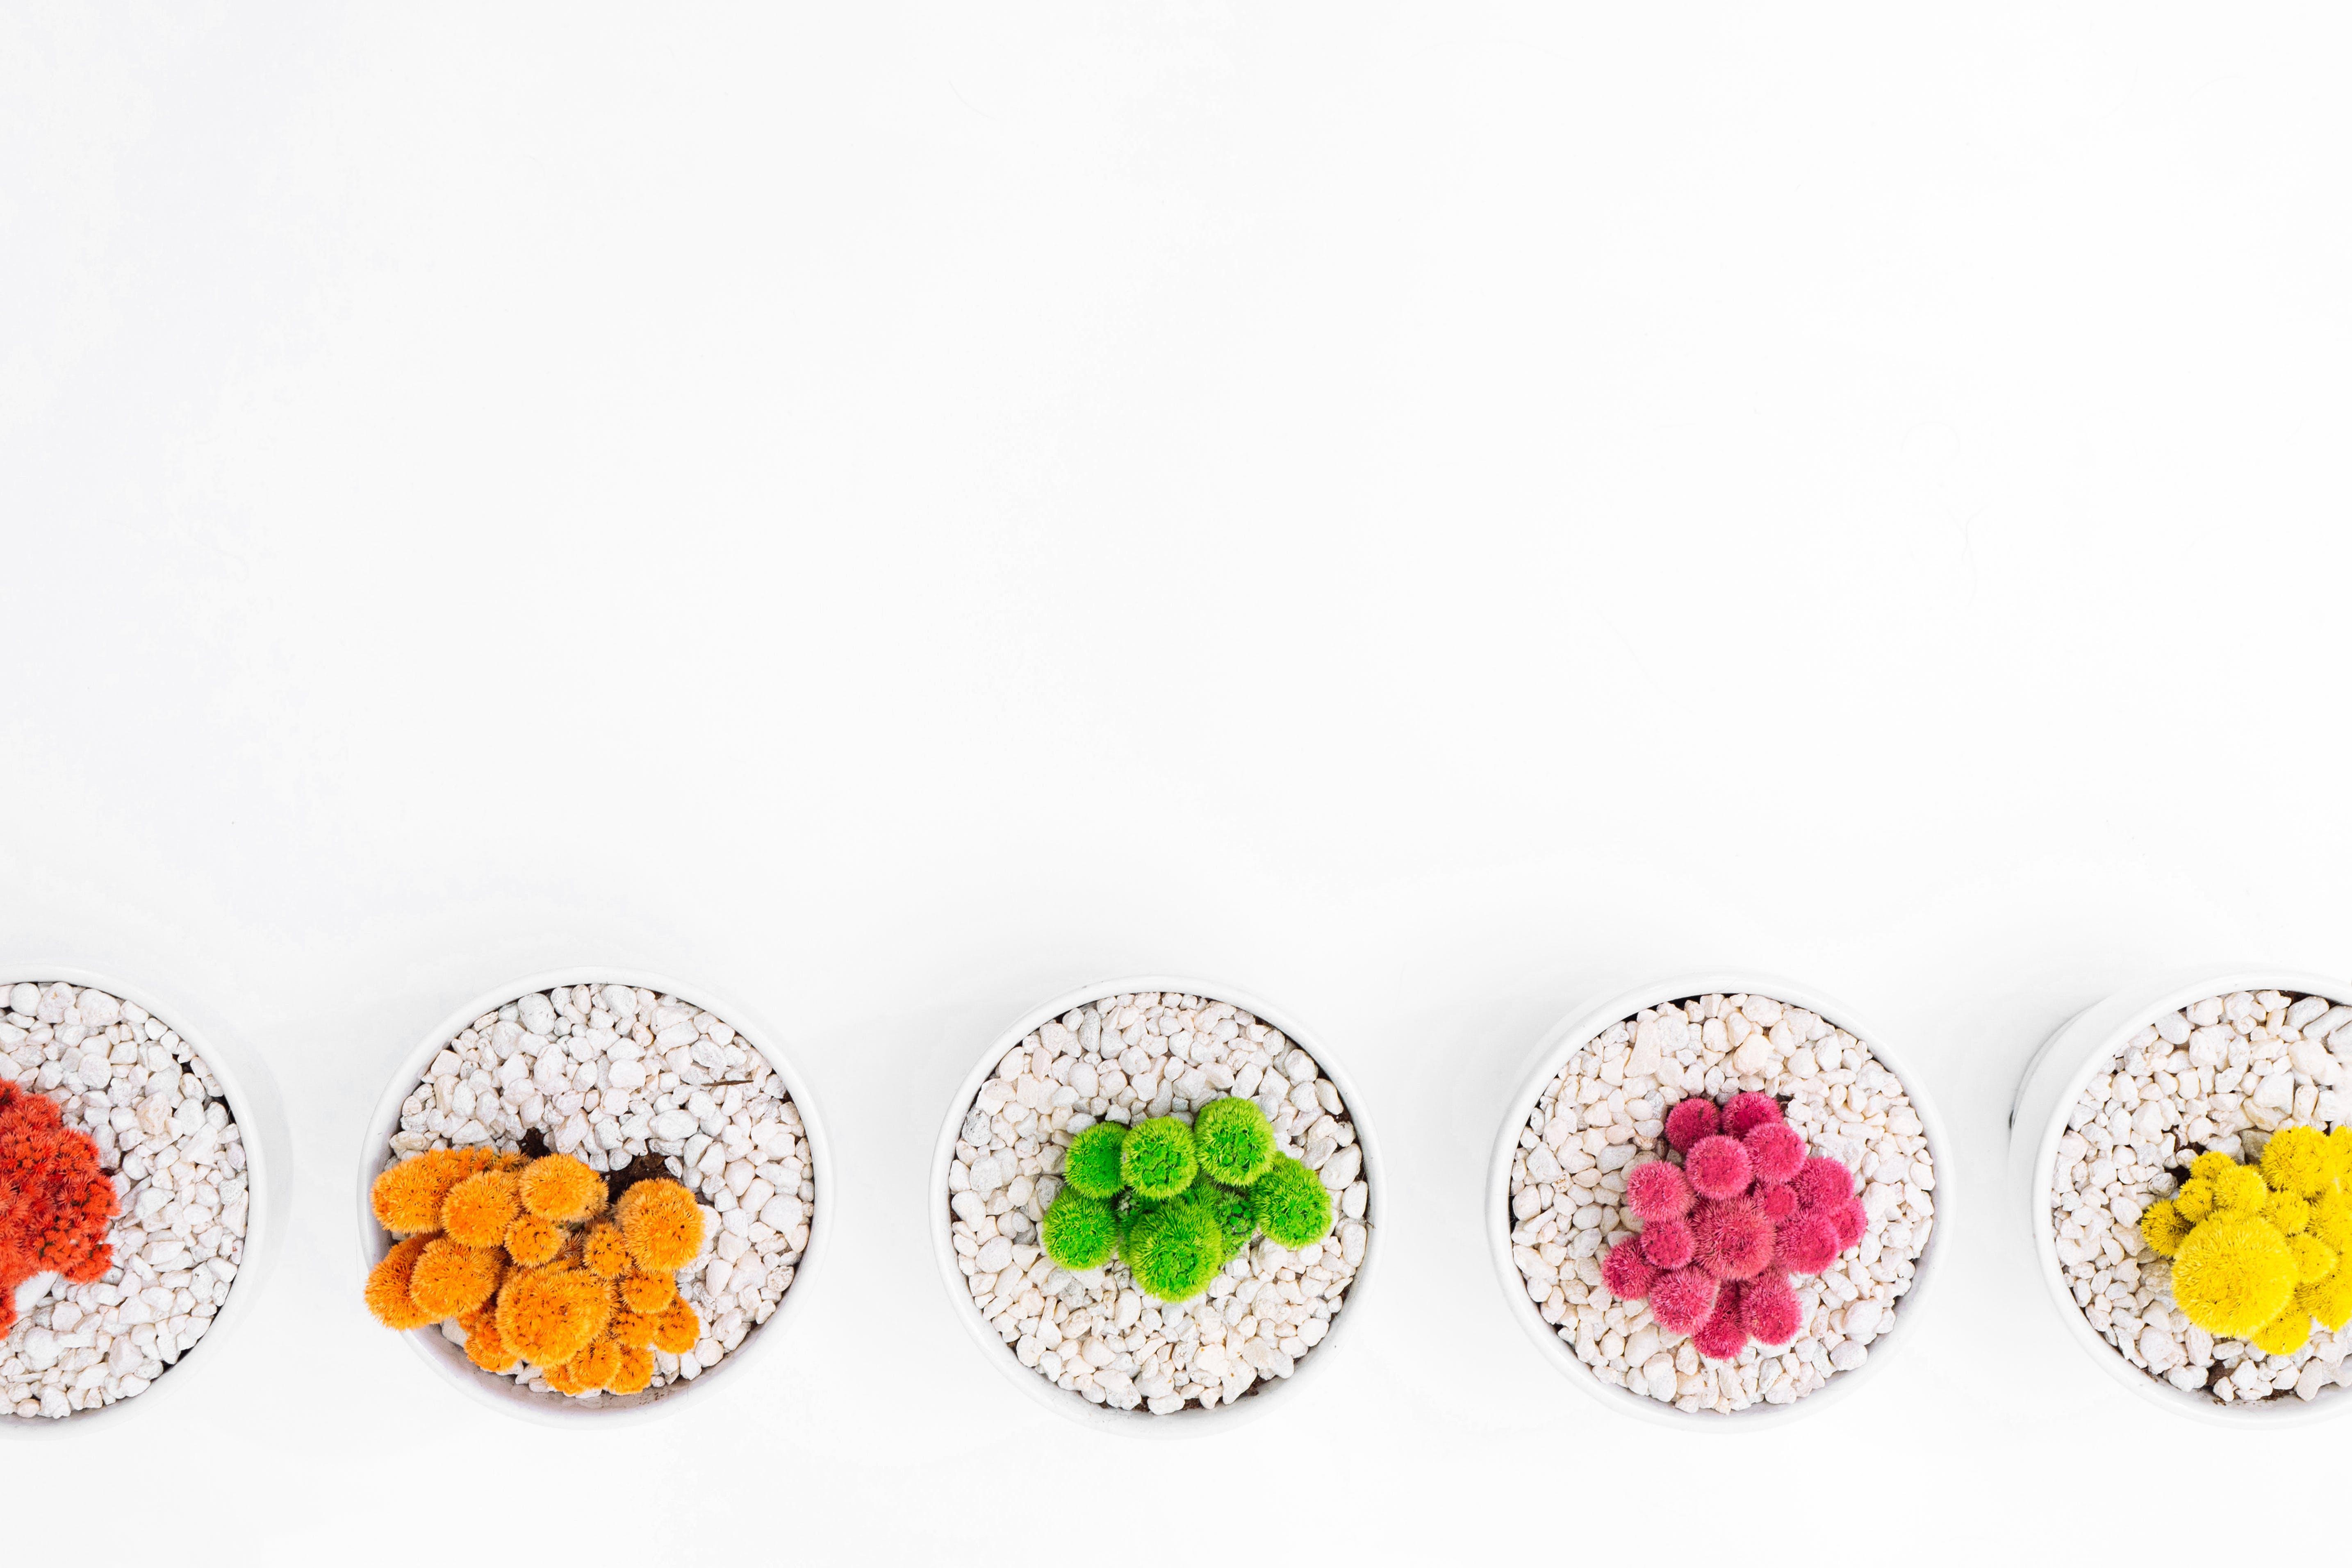 Kostenloses Stock Foto zu felsen, pflanze, topf, bunt